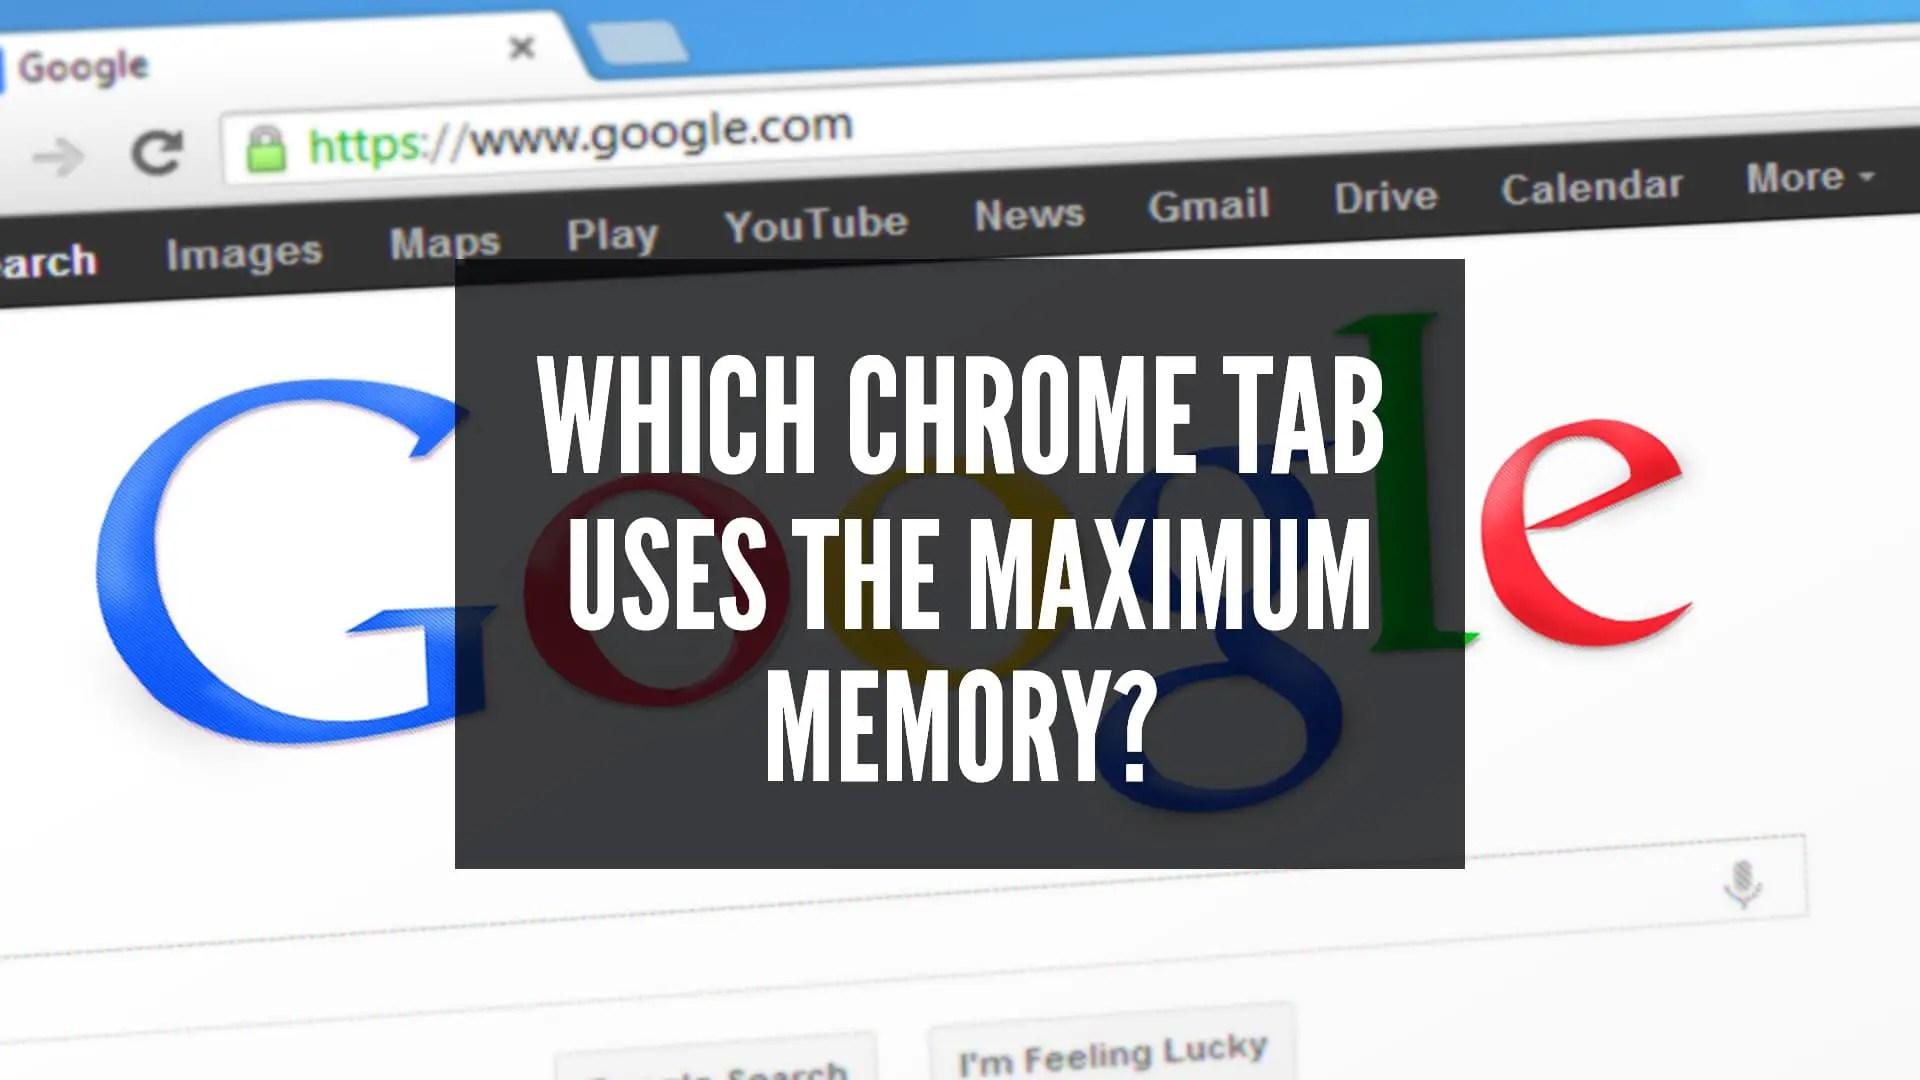 Chrome taskbar How To Tell Which Chrome Tab Is Using Memory